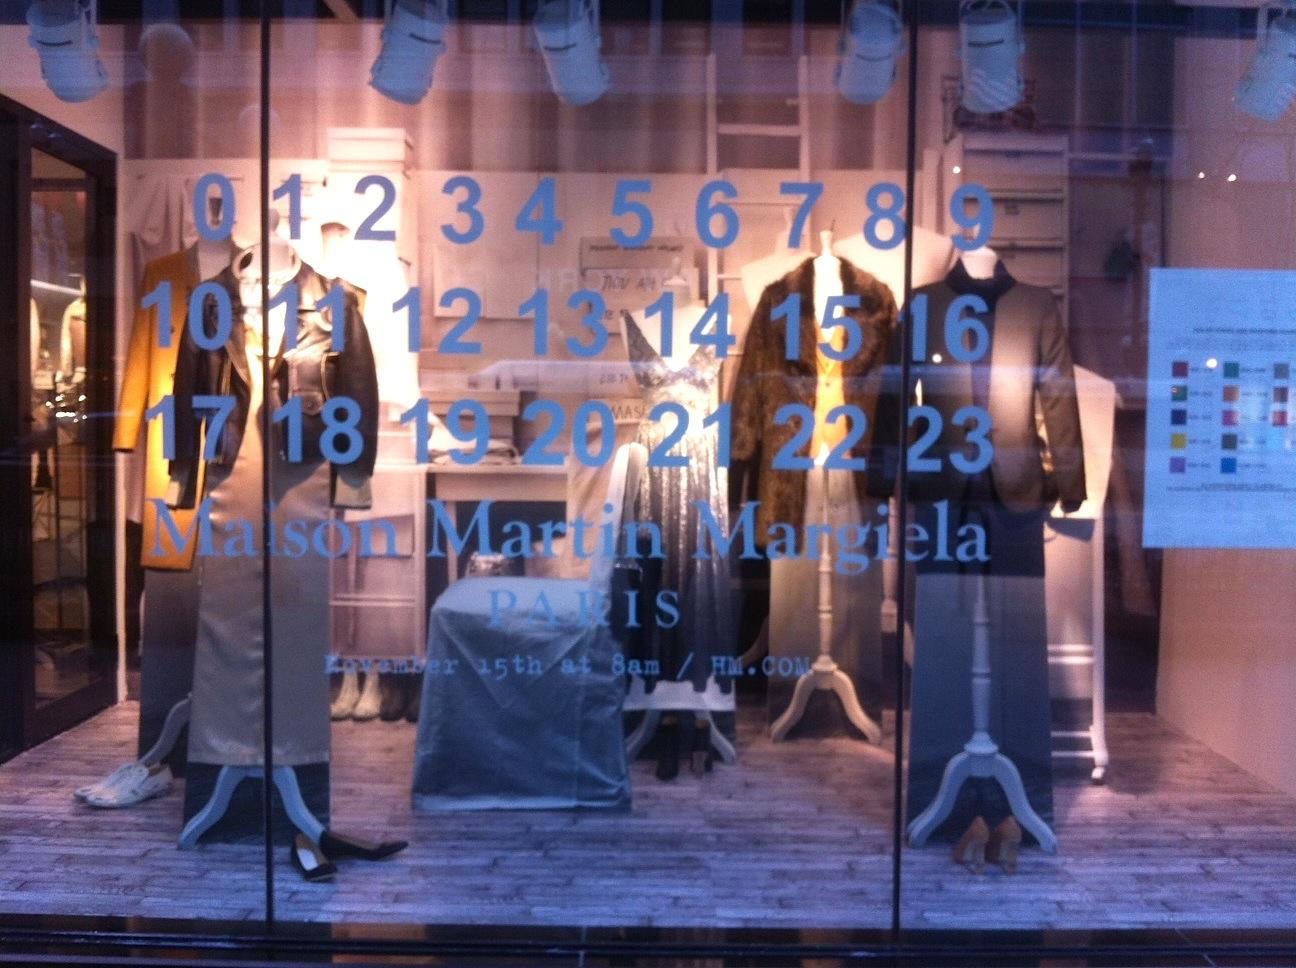 2012-11-16-Maison-Martin-Margiela-Chicago-LState%20Street-Michigan%20Ave-1.JPG